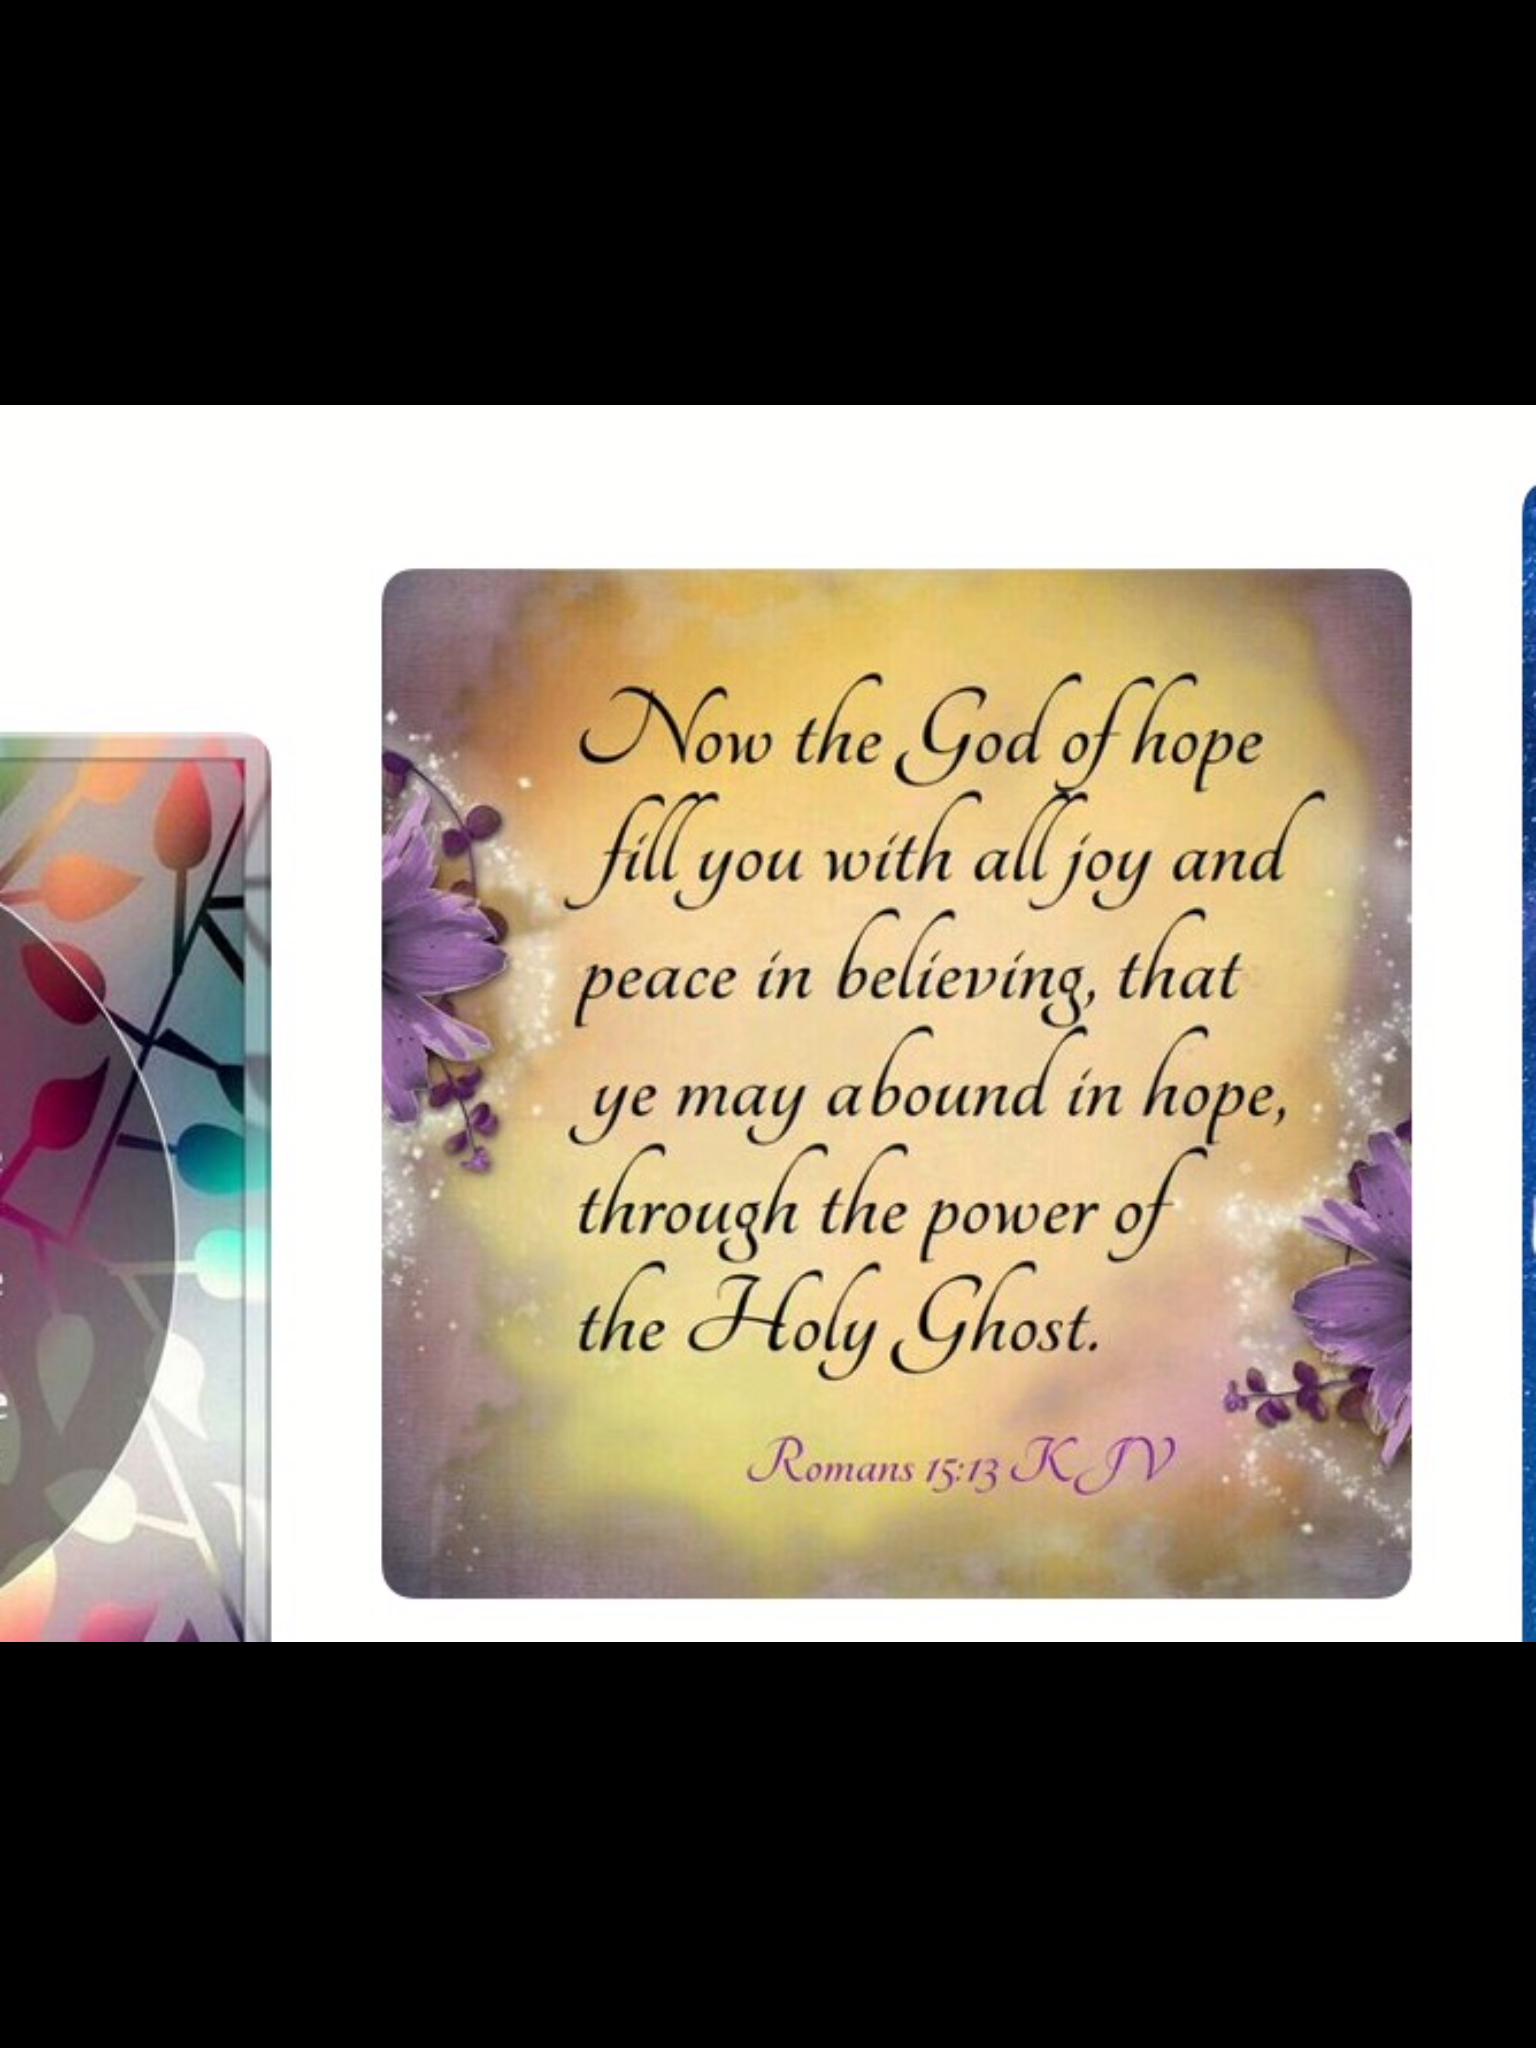 Pin de Elida Ortega-Velez en Christian Quotes   Pinterest   Frases